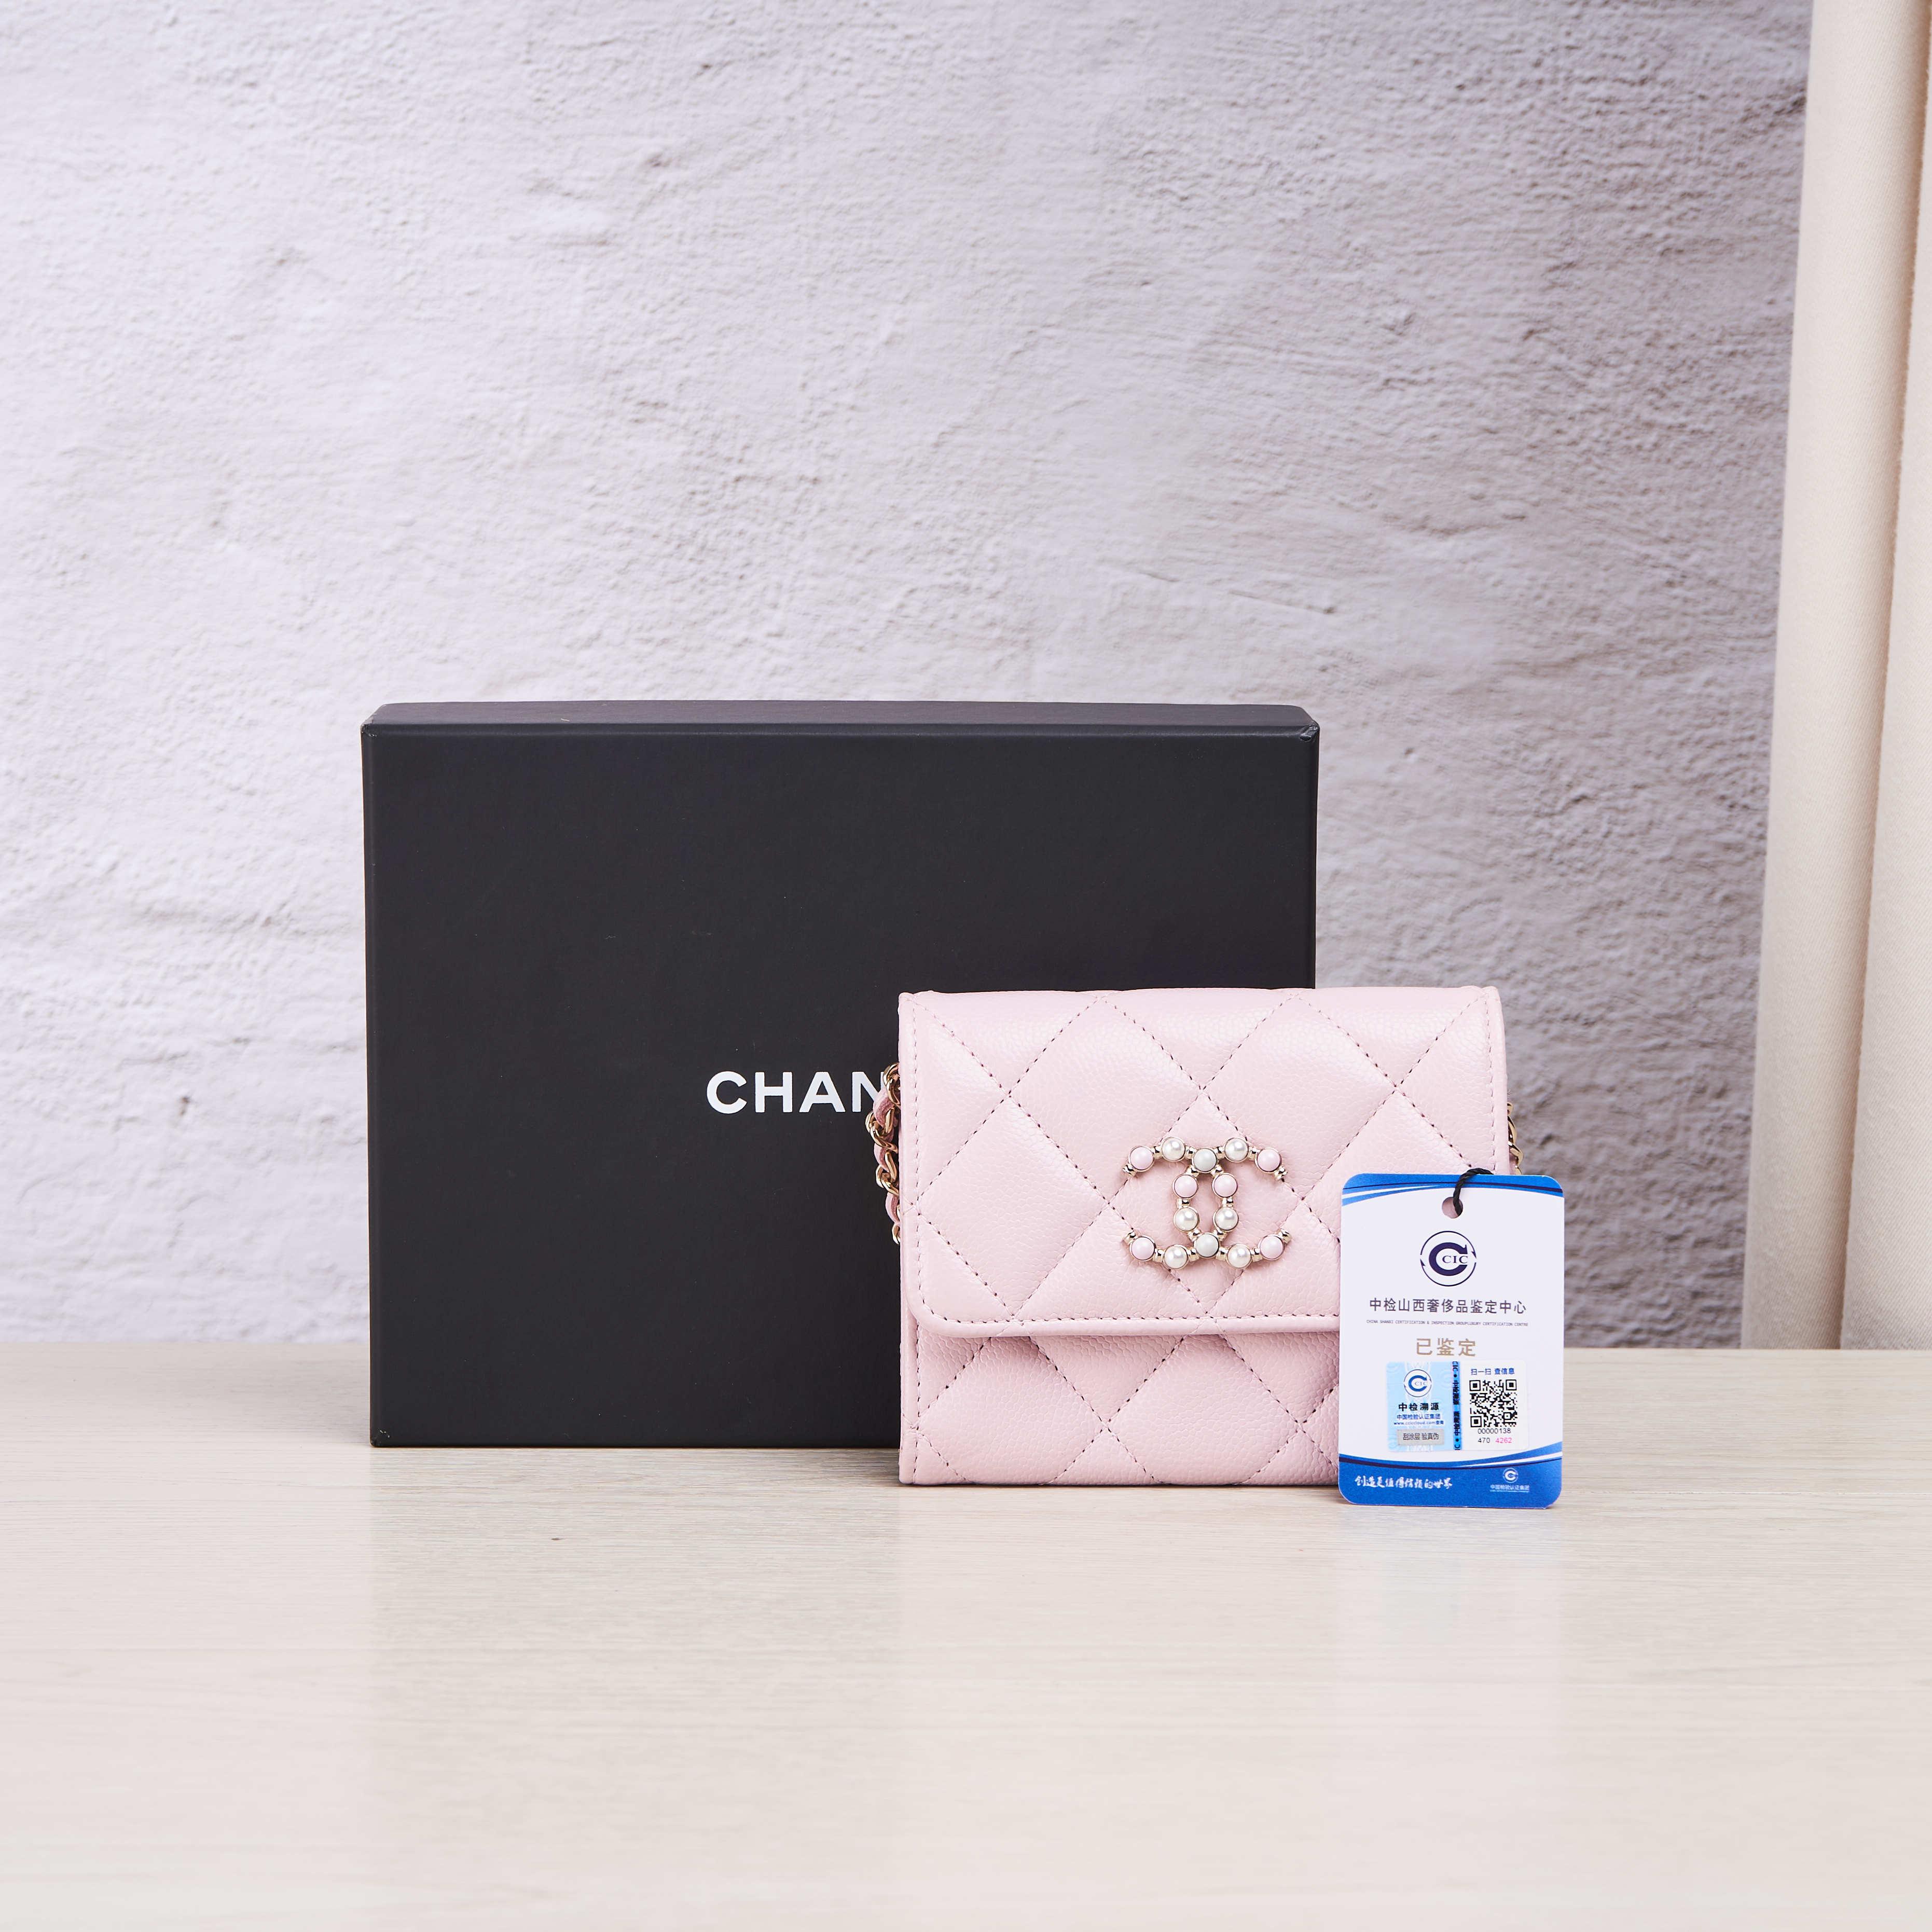 chanel链条包 临时【95新】Chanel香奈儿 粉色链条包mini  公价¥12000_推荐淘宝好看的chanel链条包